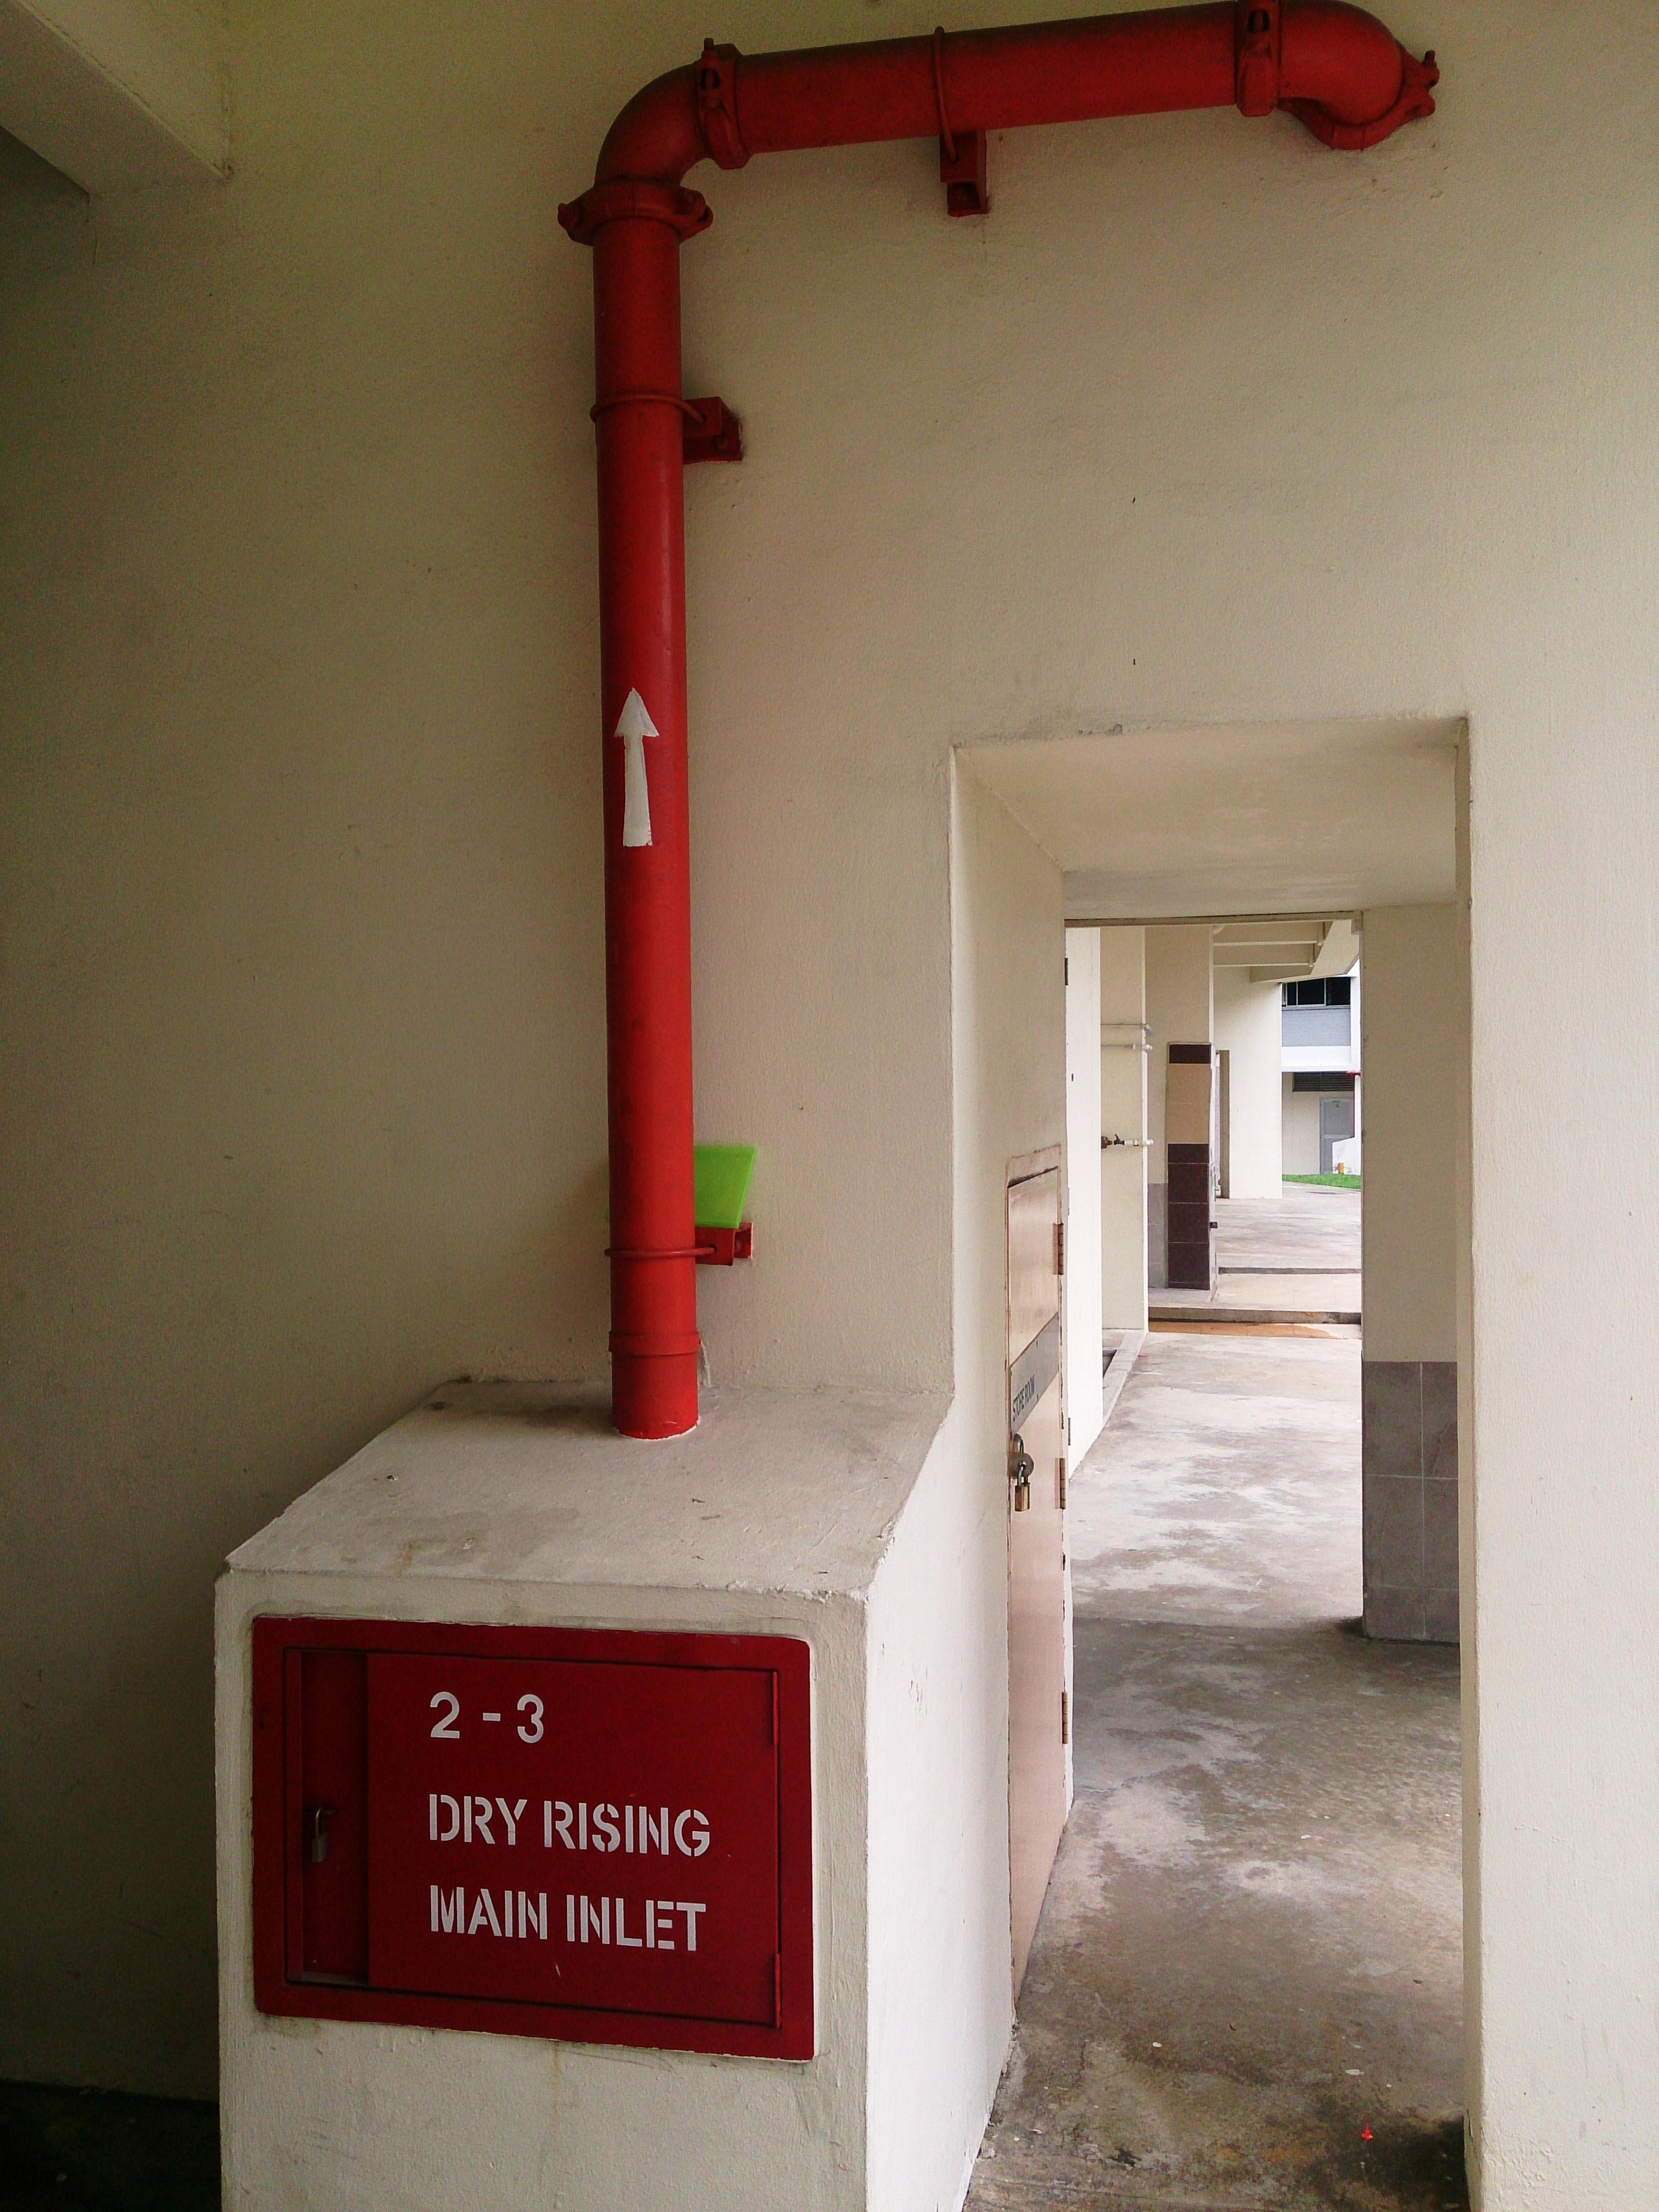 Dry riser - Wikipedia